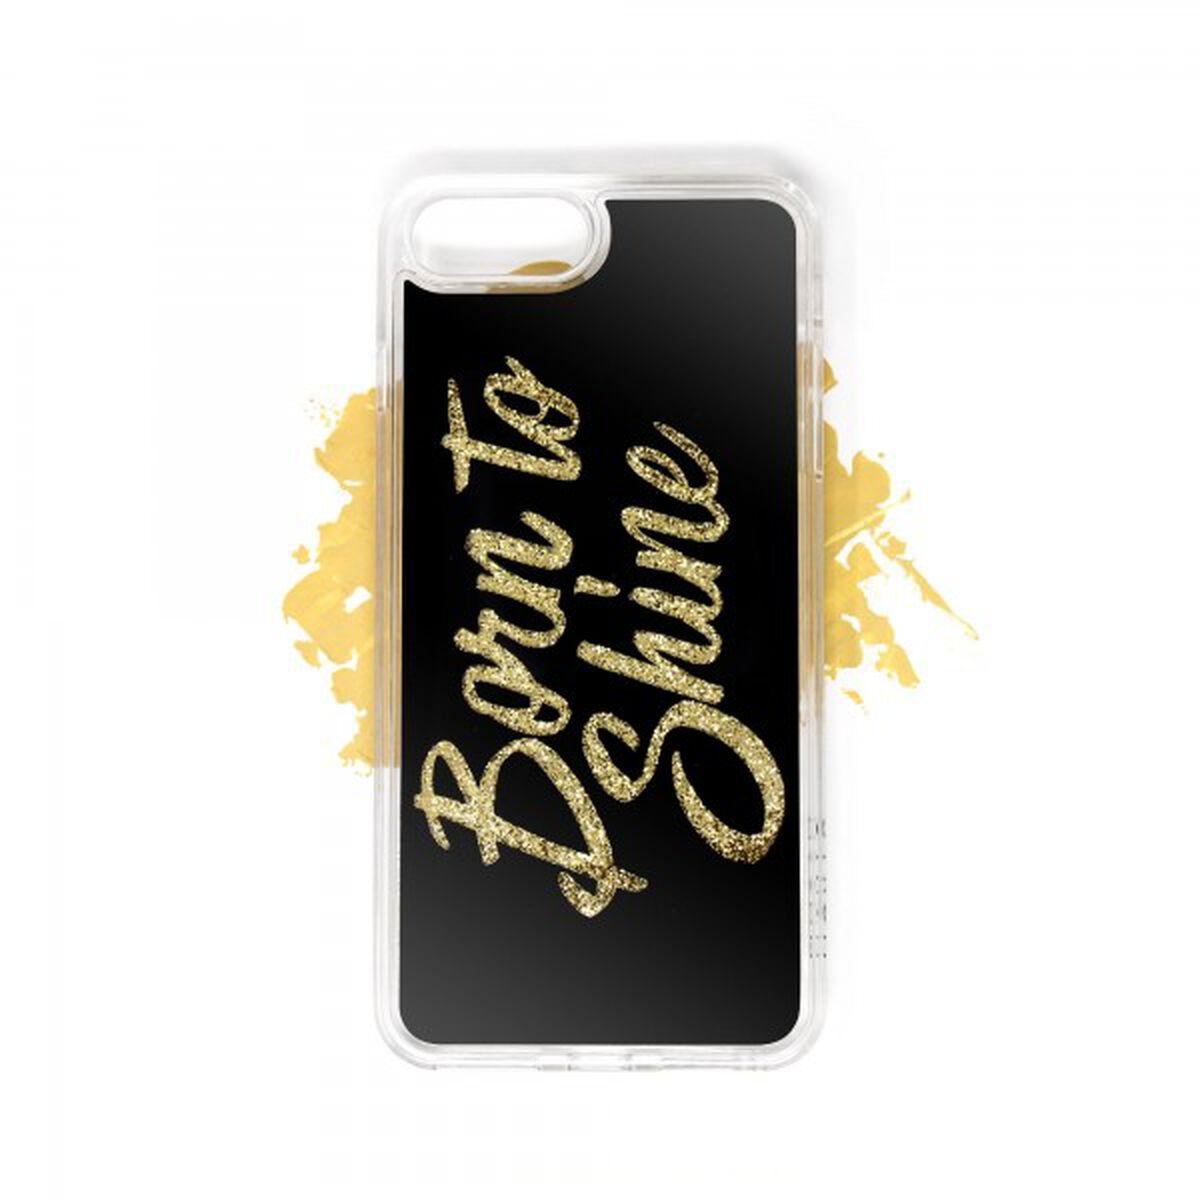 Born to Shine Liquid Glitter Case (Gold) for Apple iPhone 8, 7, 6s, 6 Plus